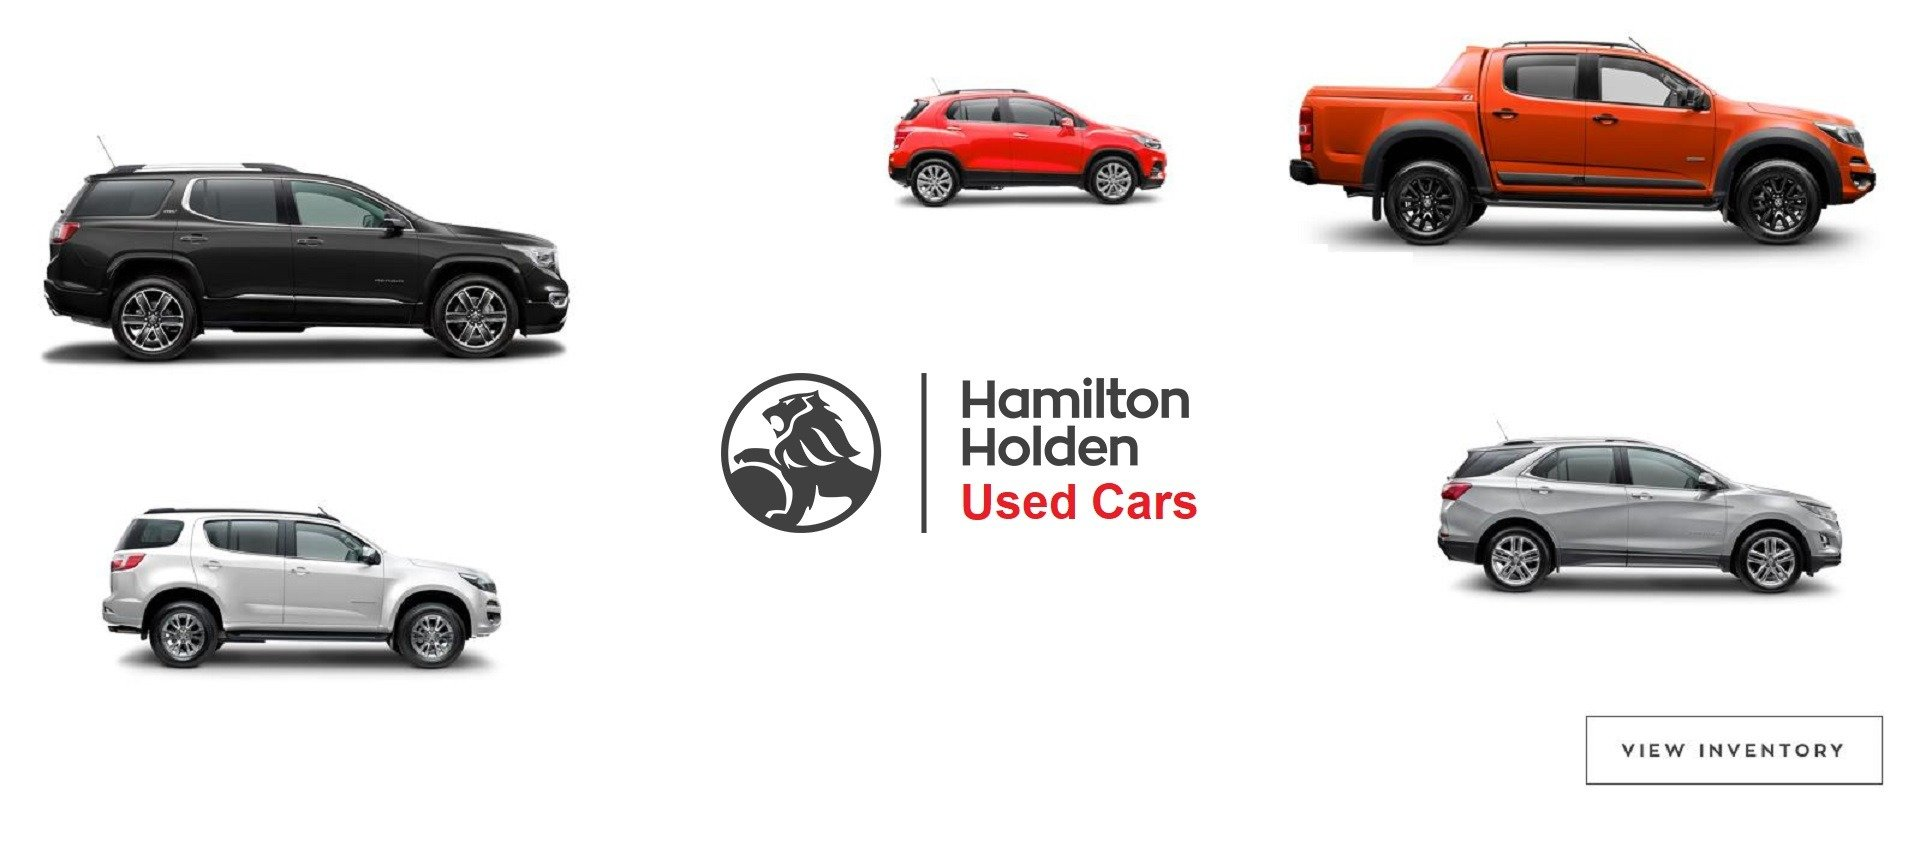 Hamilton Holden Used Cars